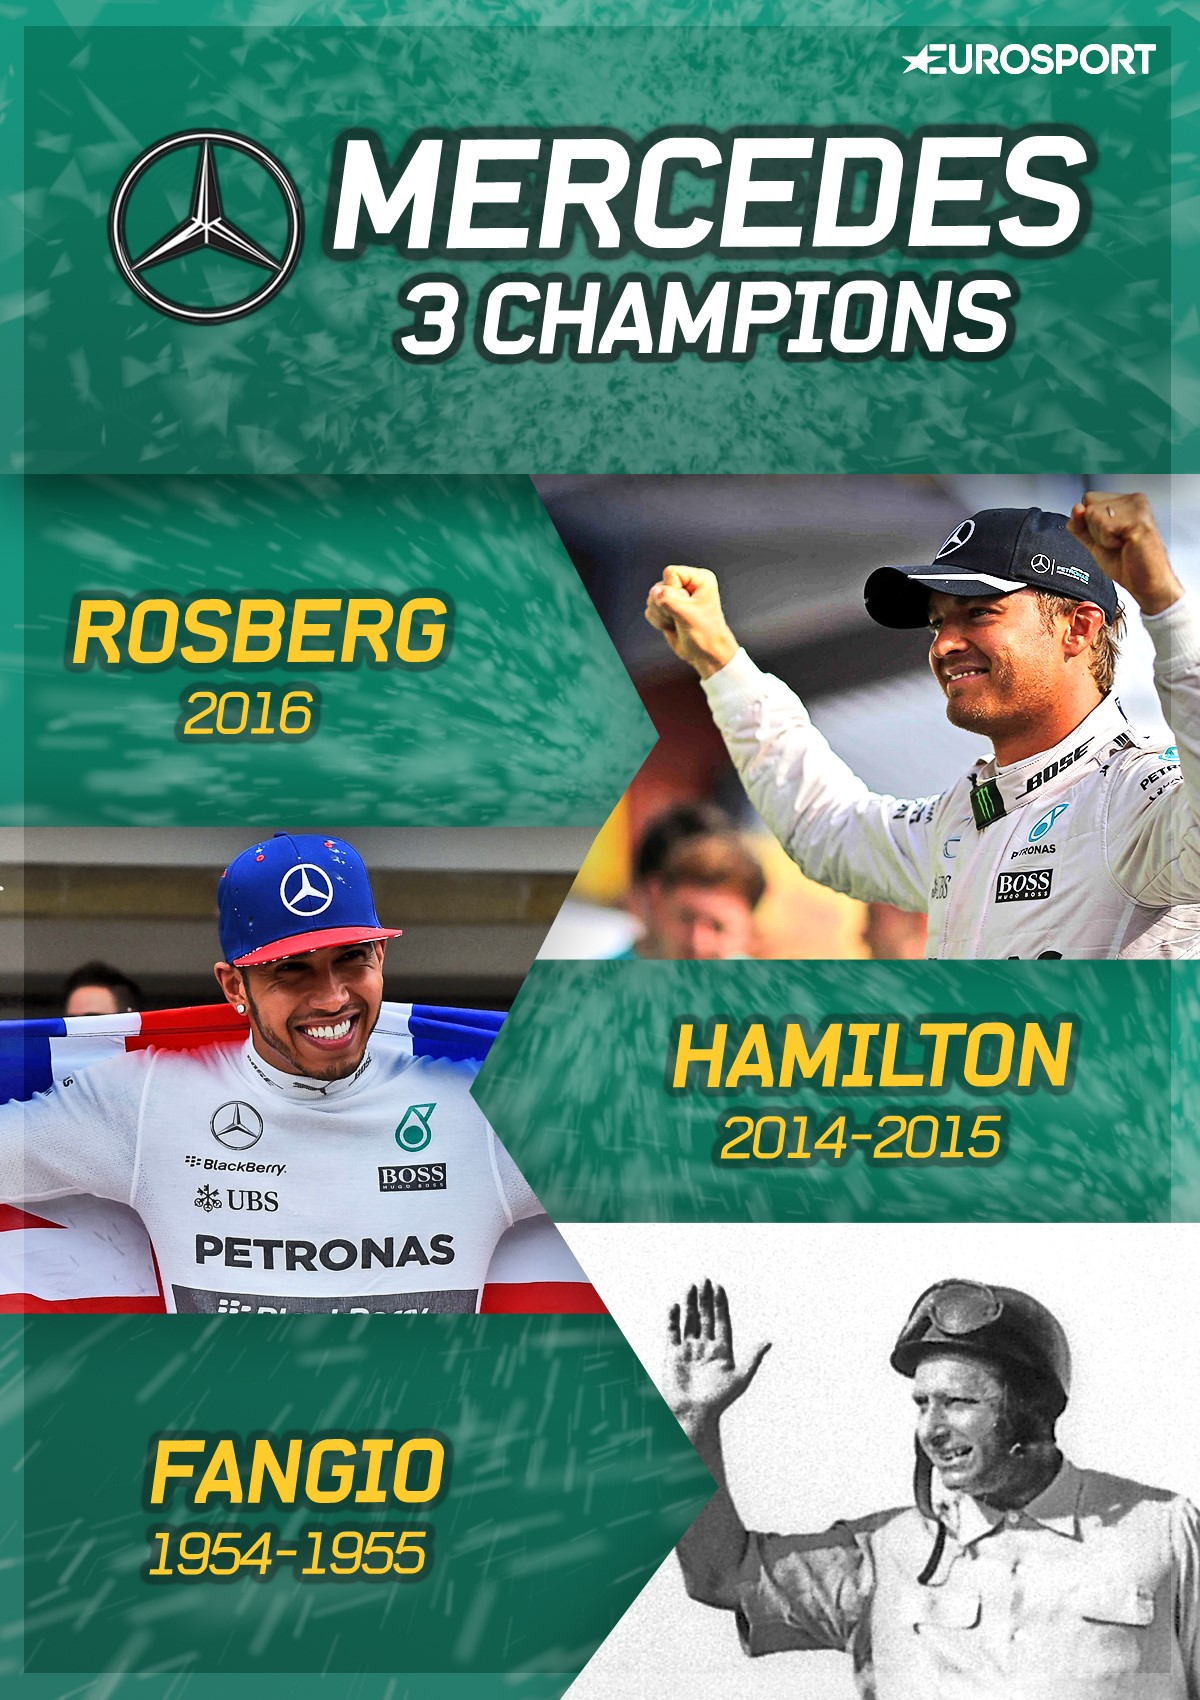 Fangio, Hamilton, Nico Rosberg, champions de Mercedes